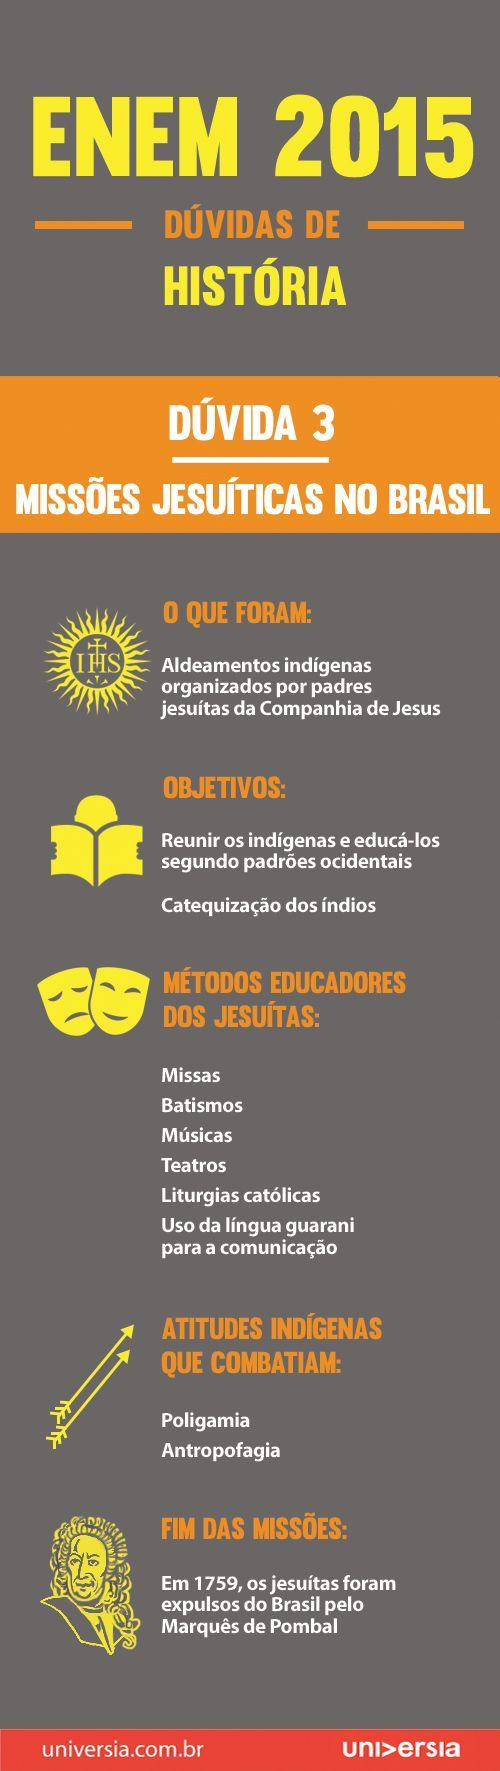 resumao-duvidas-historia-enem-missoes-jesuiticas-no-brasil-infografico.jpg… http://www.99wtf.net/young-style/178/